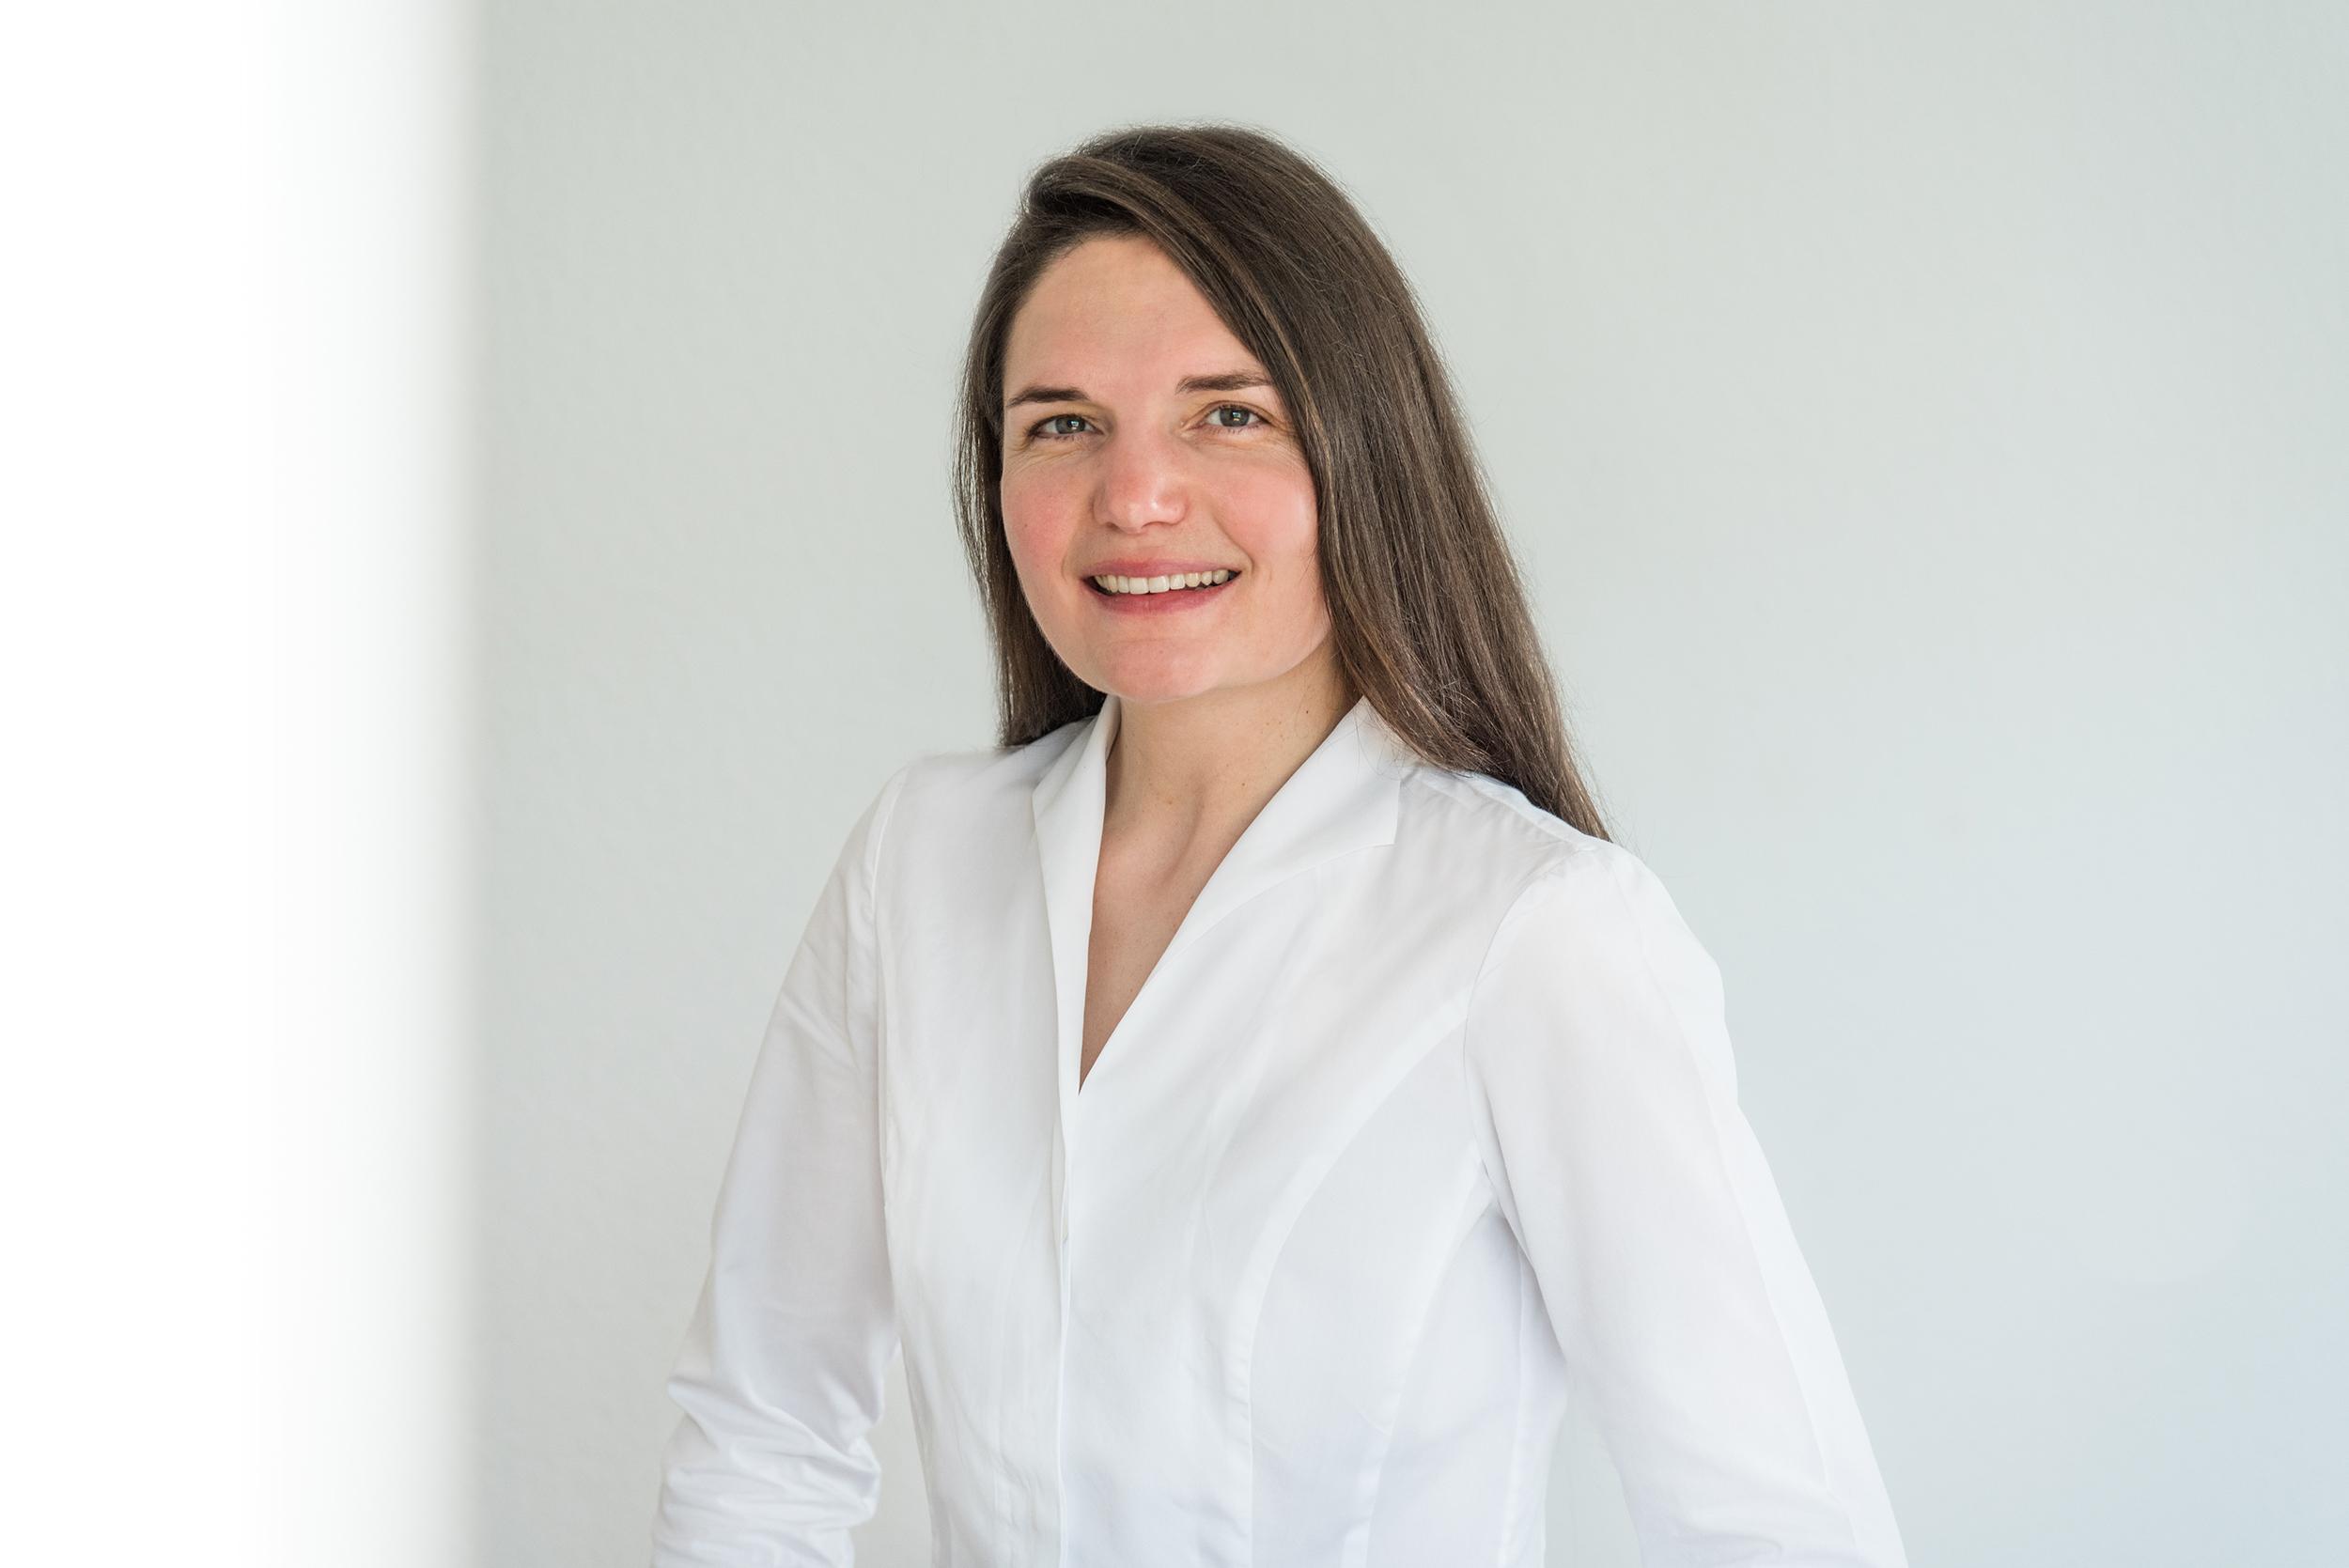 Dr. Catherine Engelhardt